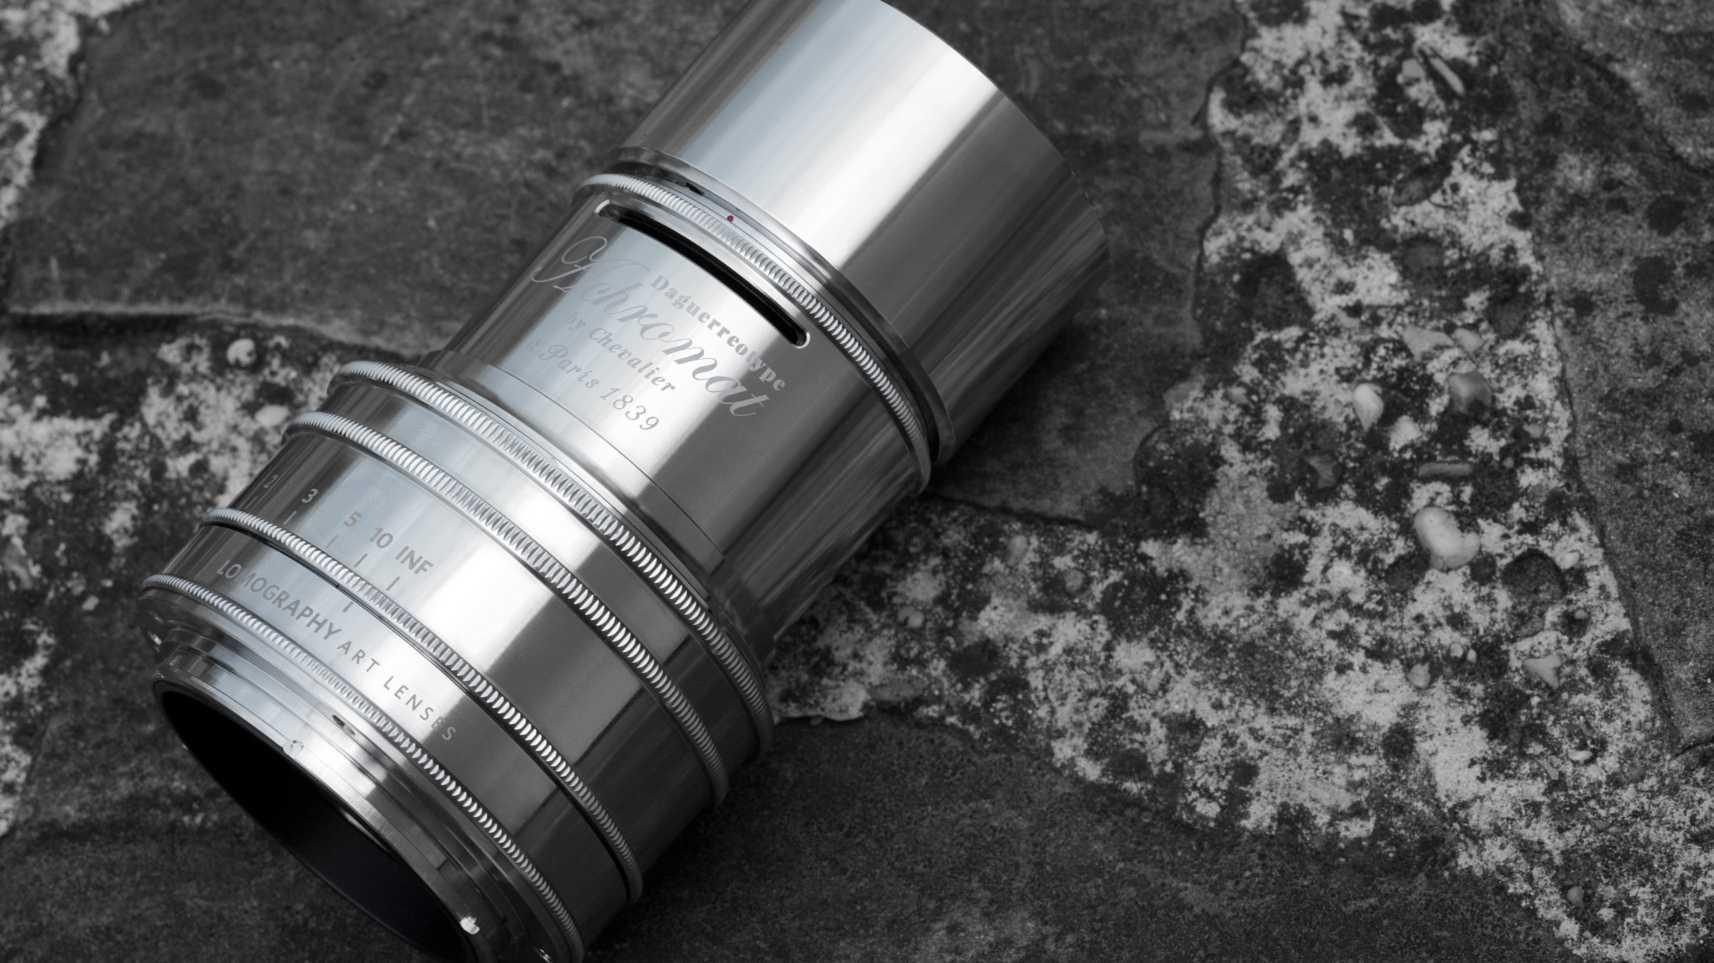 Daguerreotype Achromat 2,9/64 mm Art Lens mit Chromoberfläche